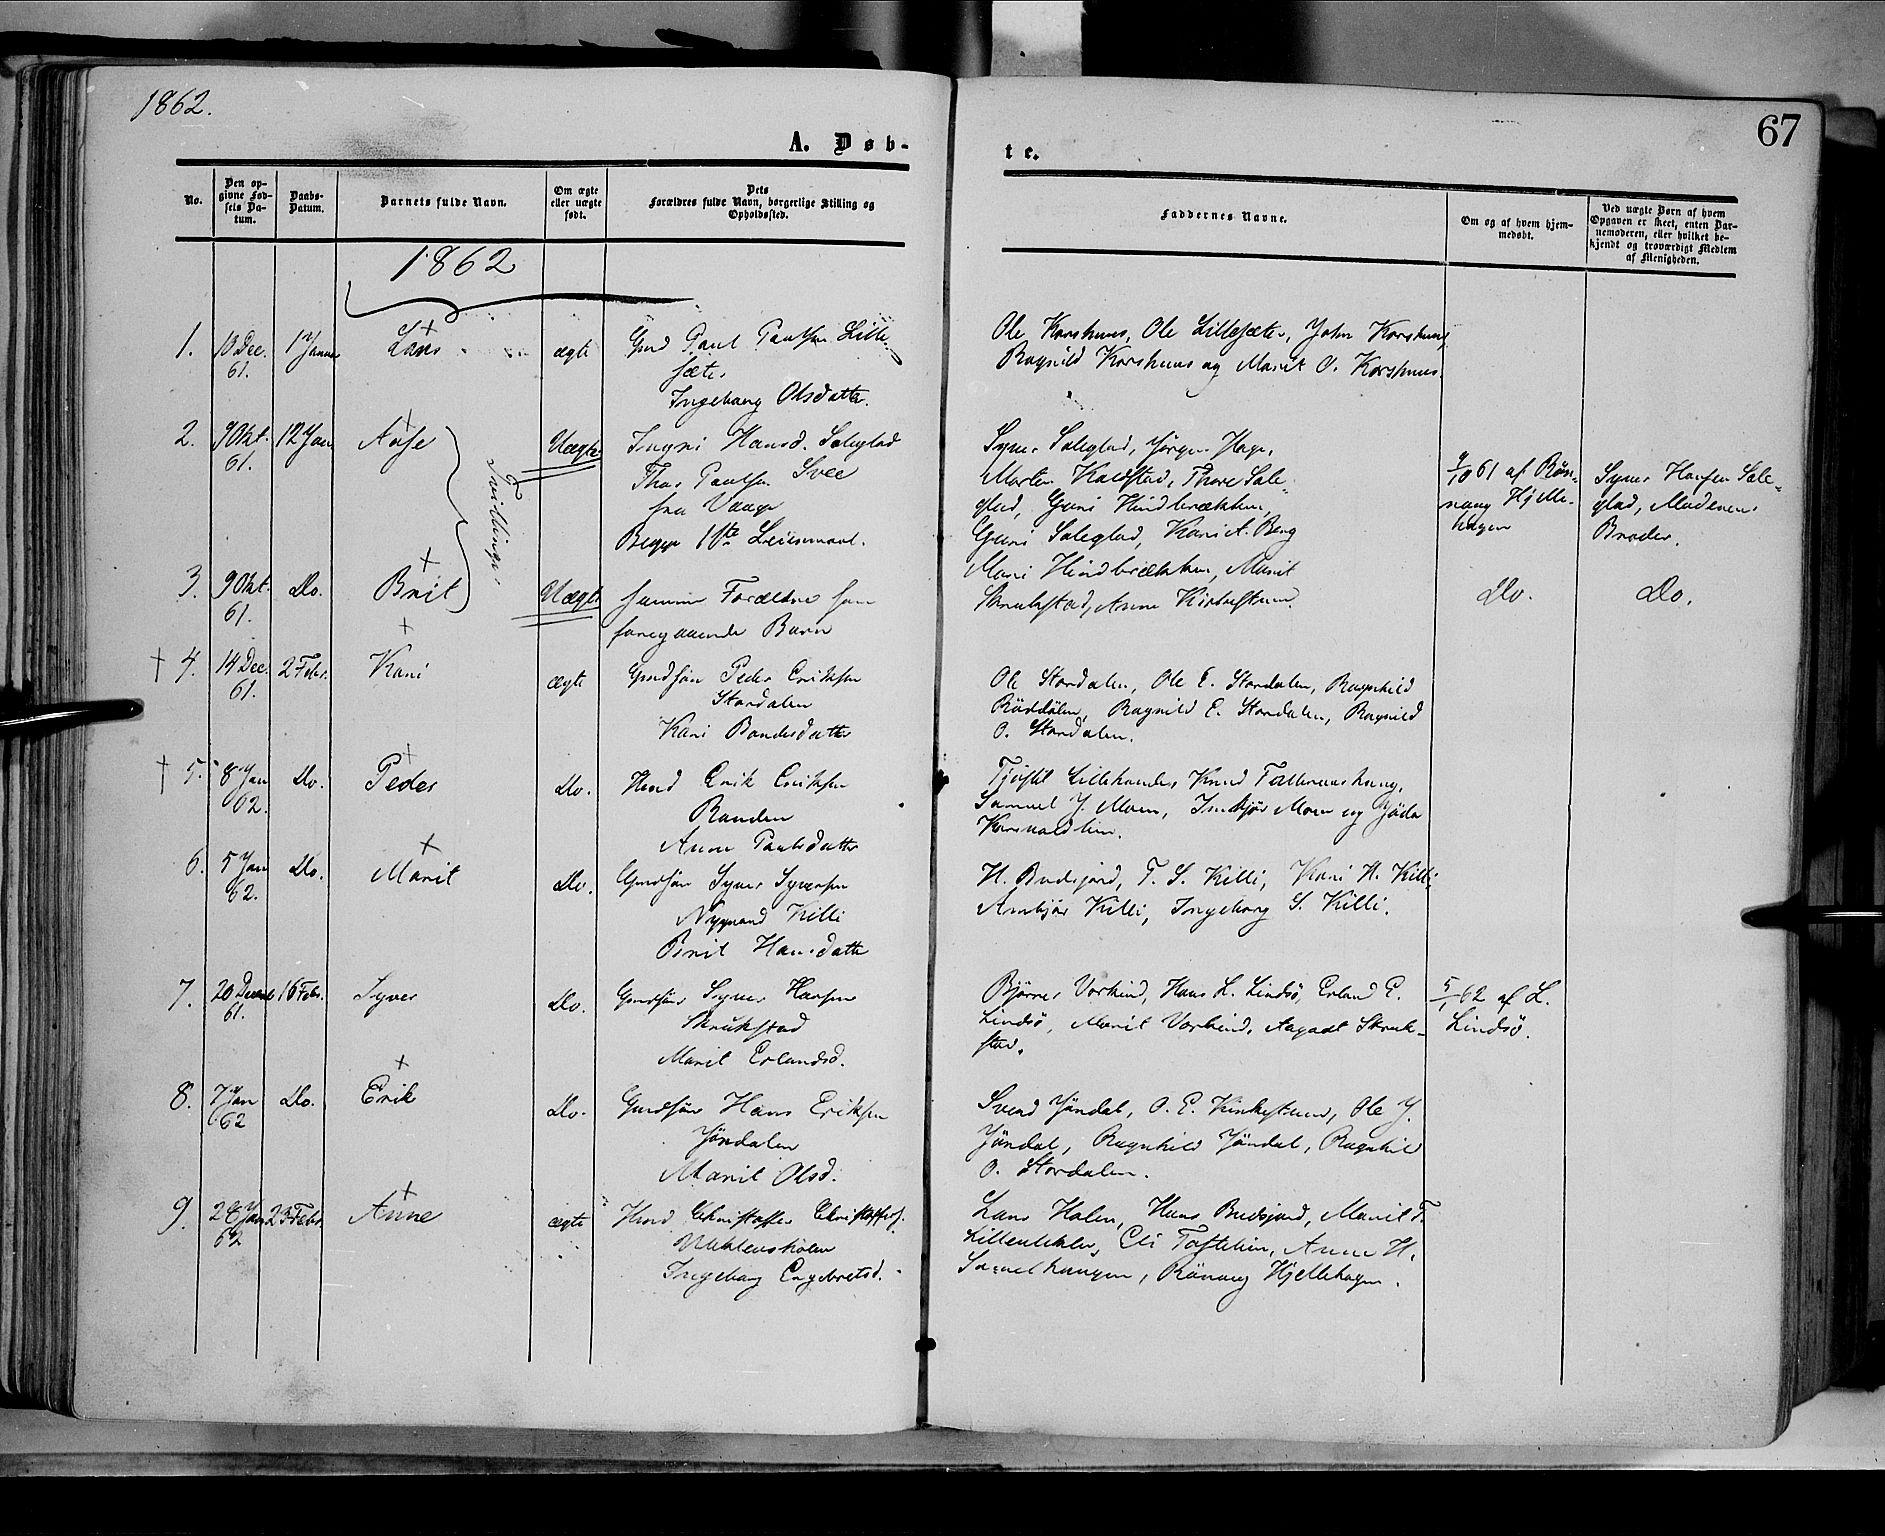 SAH, Dovre prestekontor, Ministerialbok nr. 1, 1854-1878, s. 67